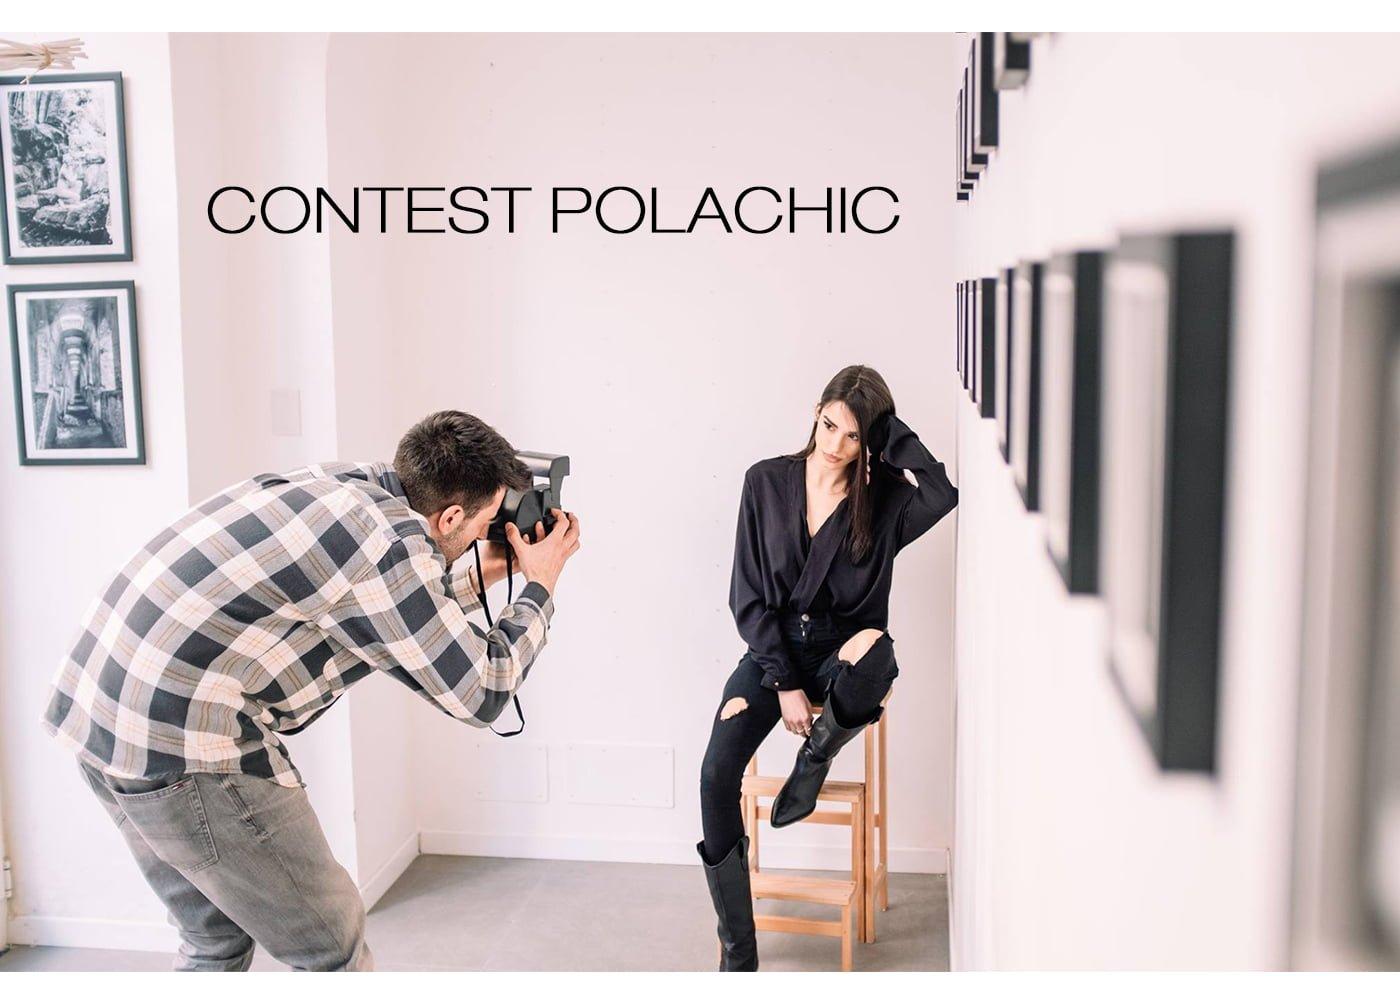 Polaroid, Polachic: Il Contest